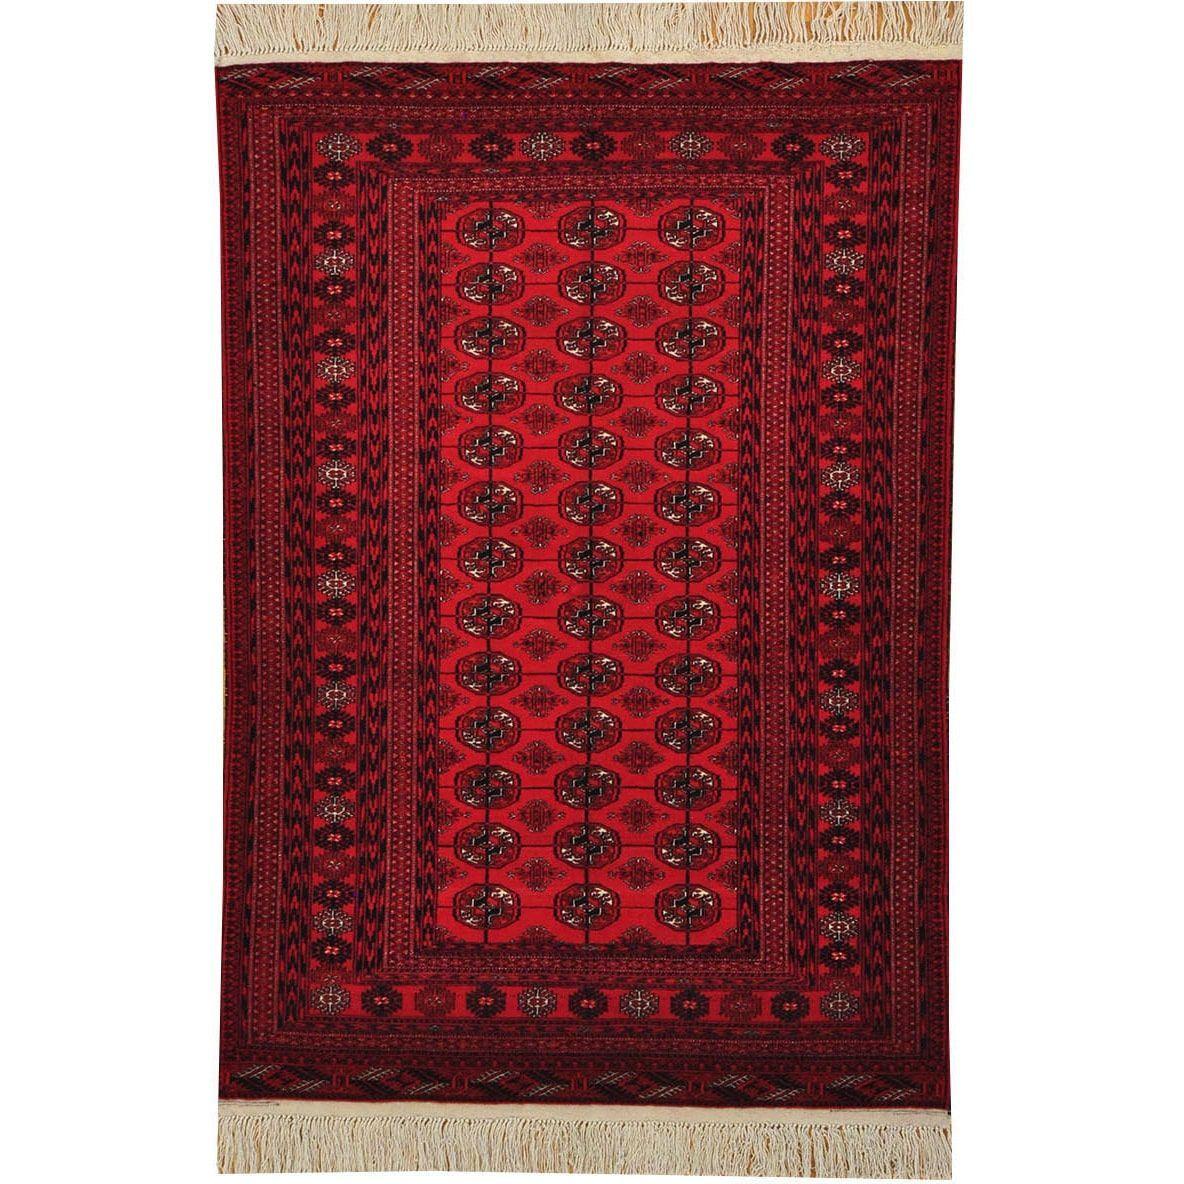 1800getarug Hand-knotted Turkoman Teke Bokhara Oriental Area Rug